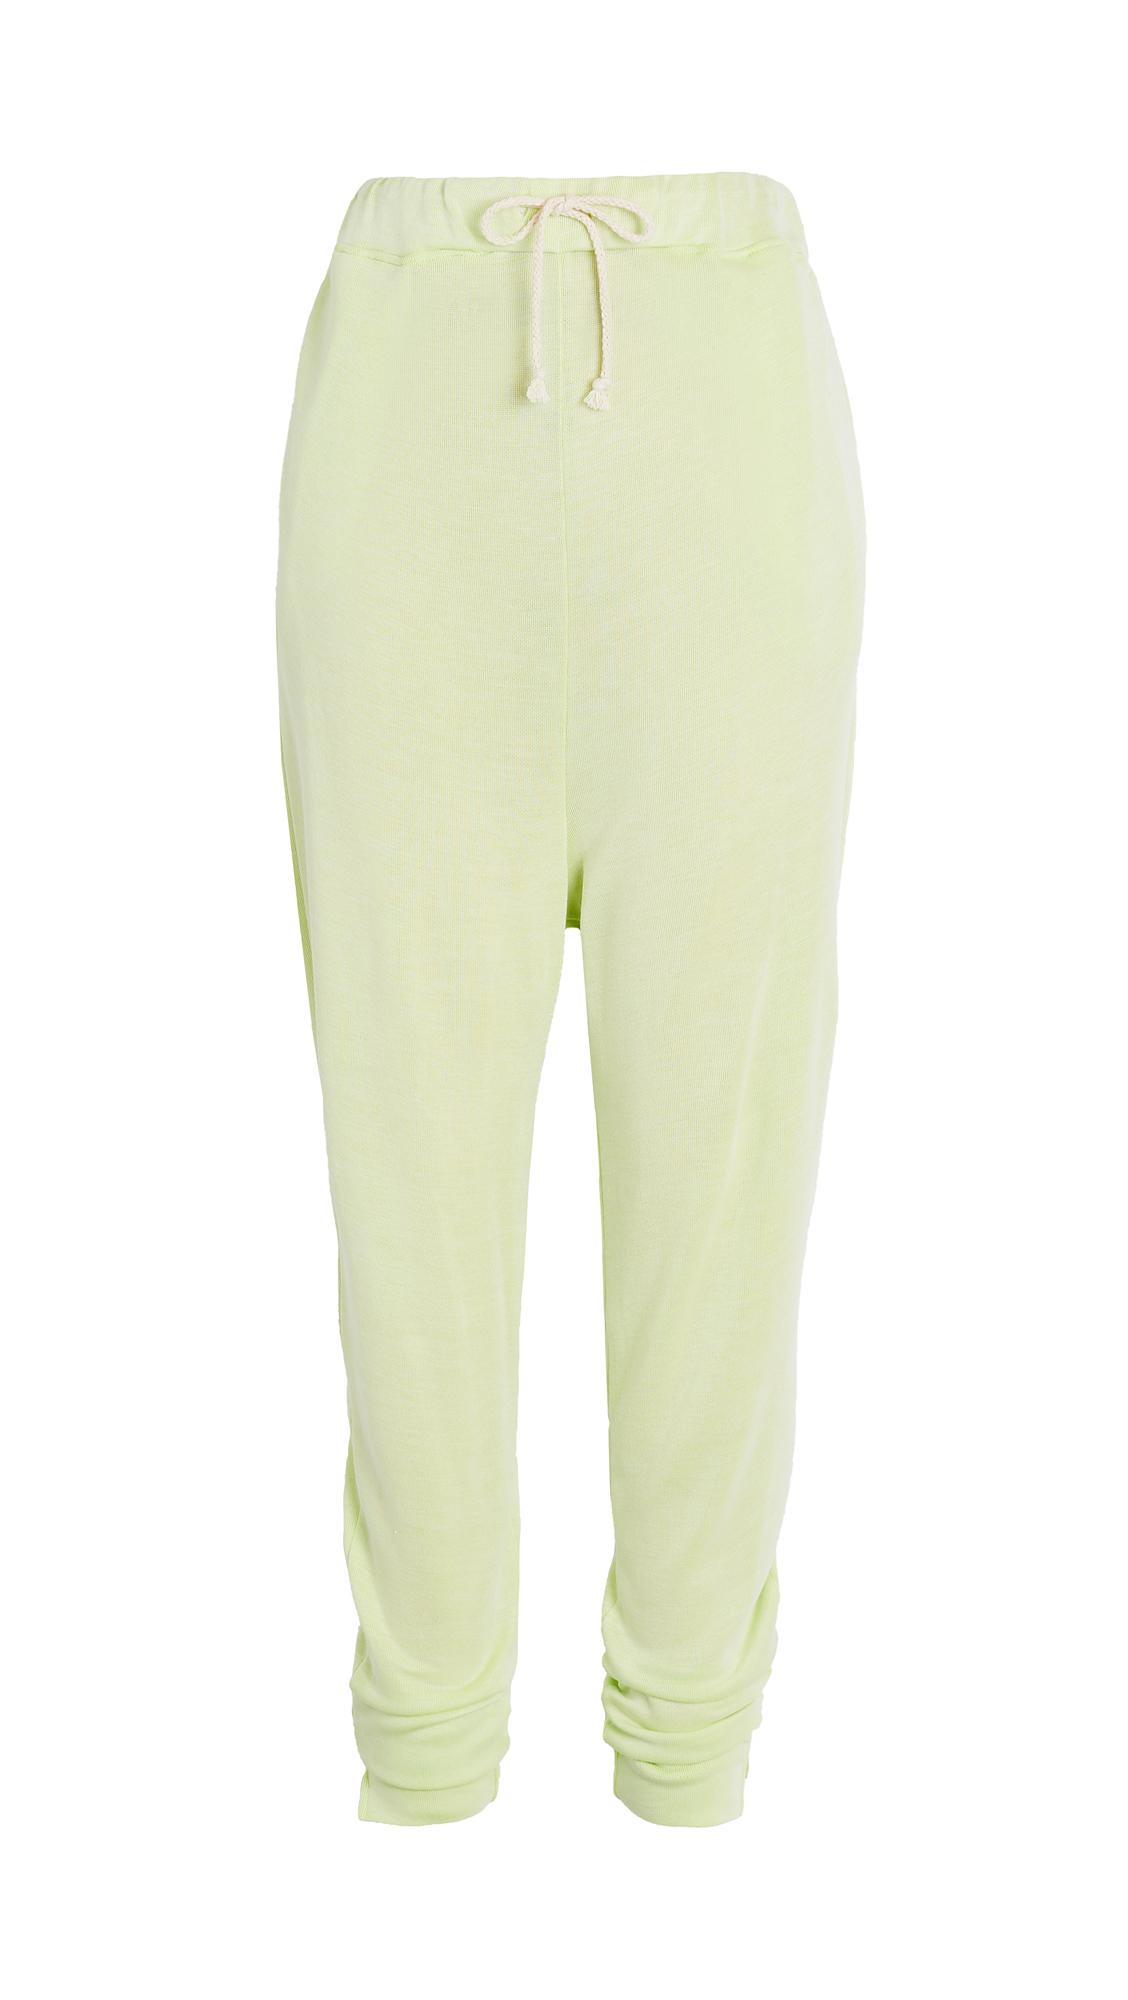 Honeydew Intimates Sun Soaker Jersey Lounge Pants